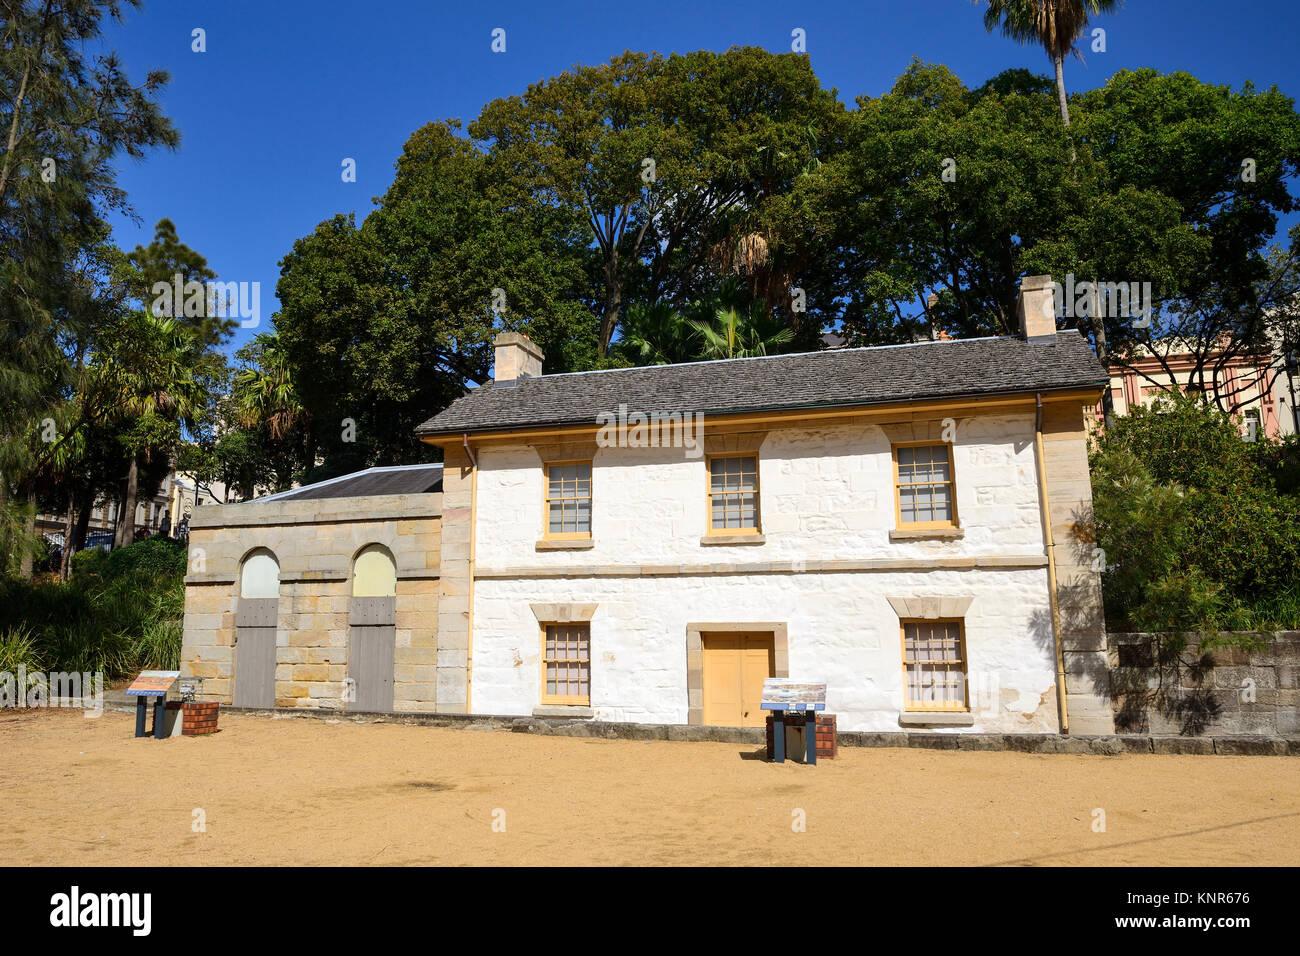 Cadmans Cottage, The Rocks, Sydney, New South Wales, Australia - Stock Image